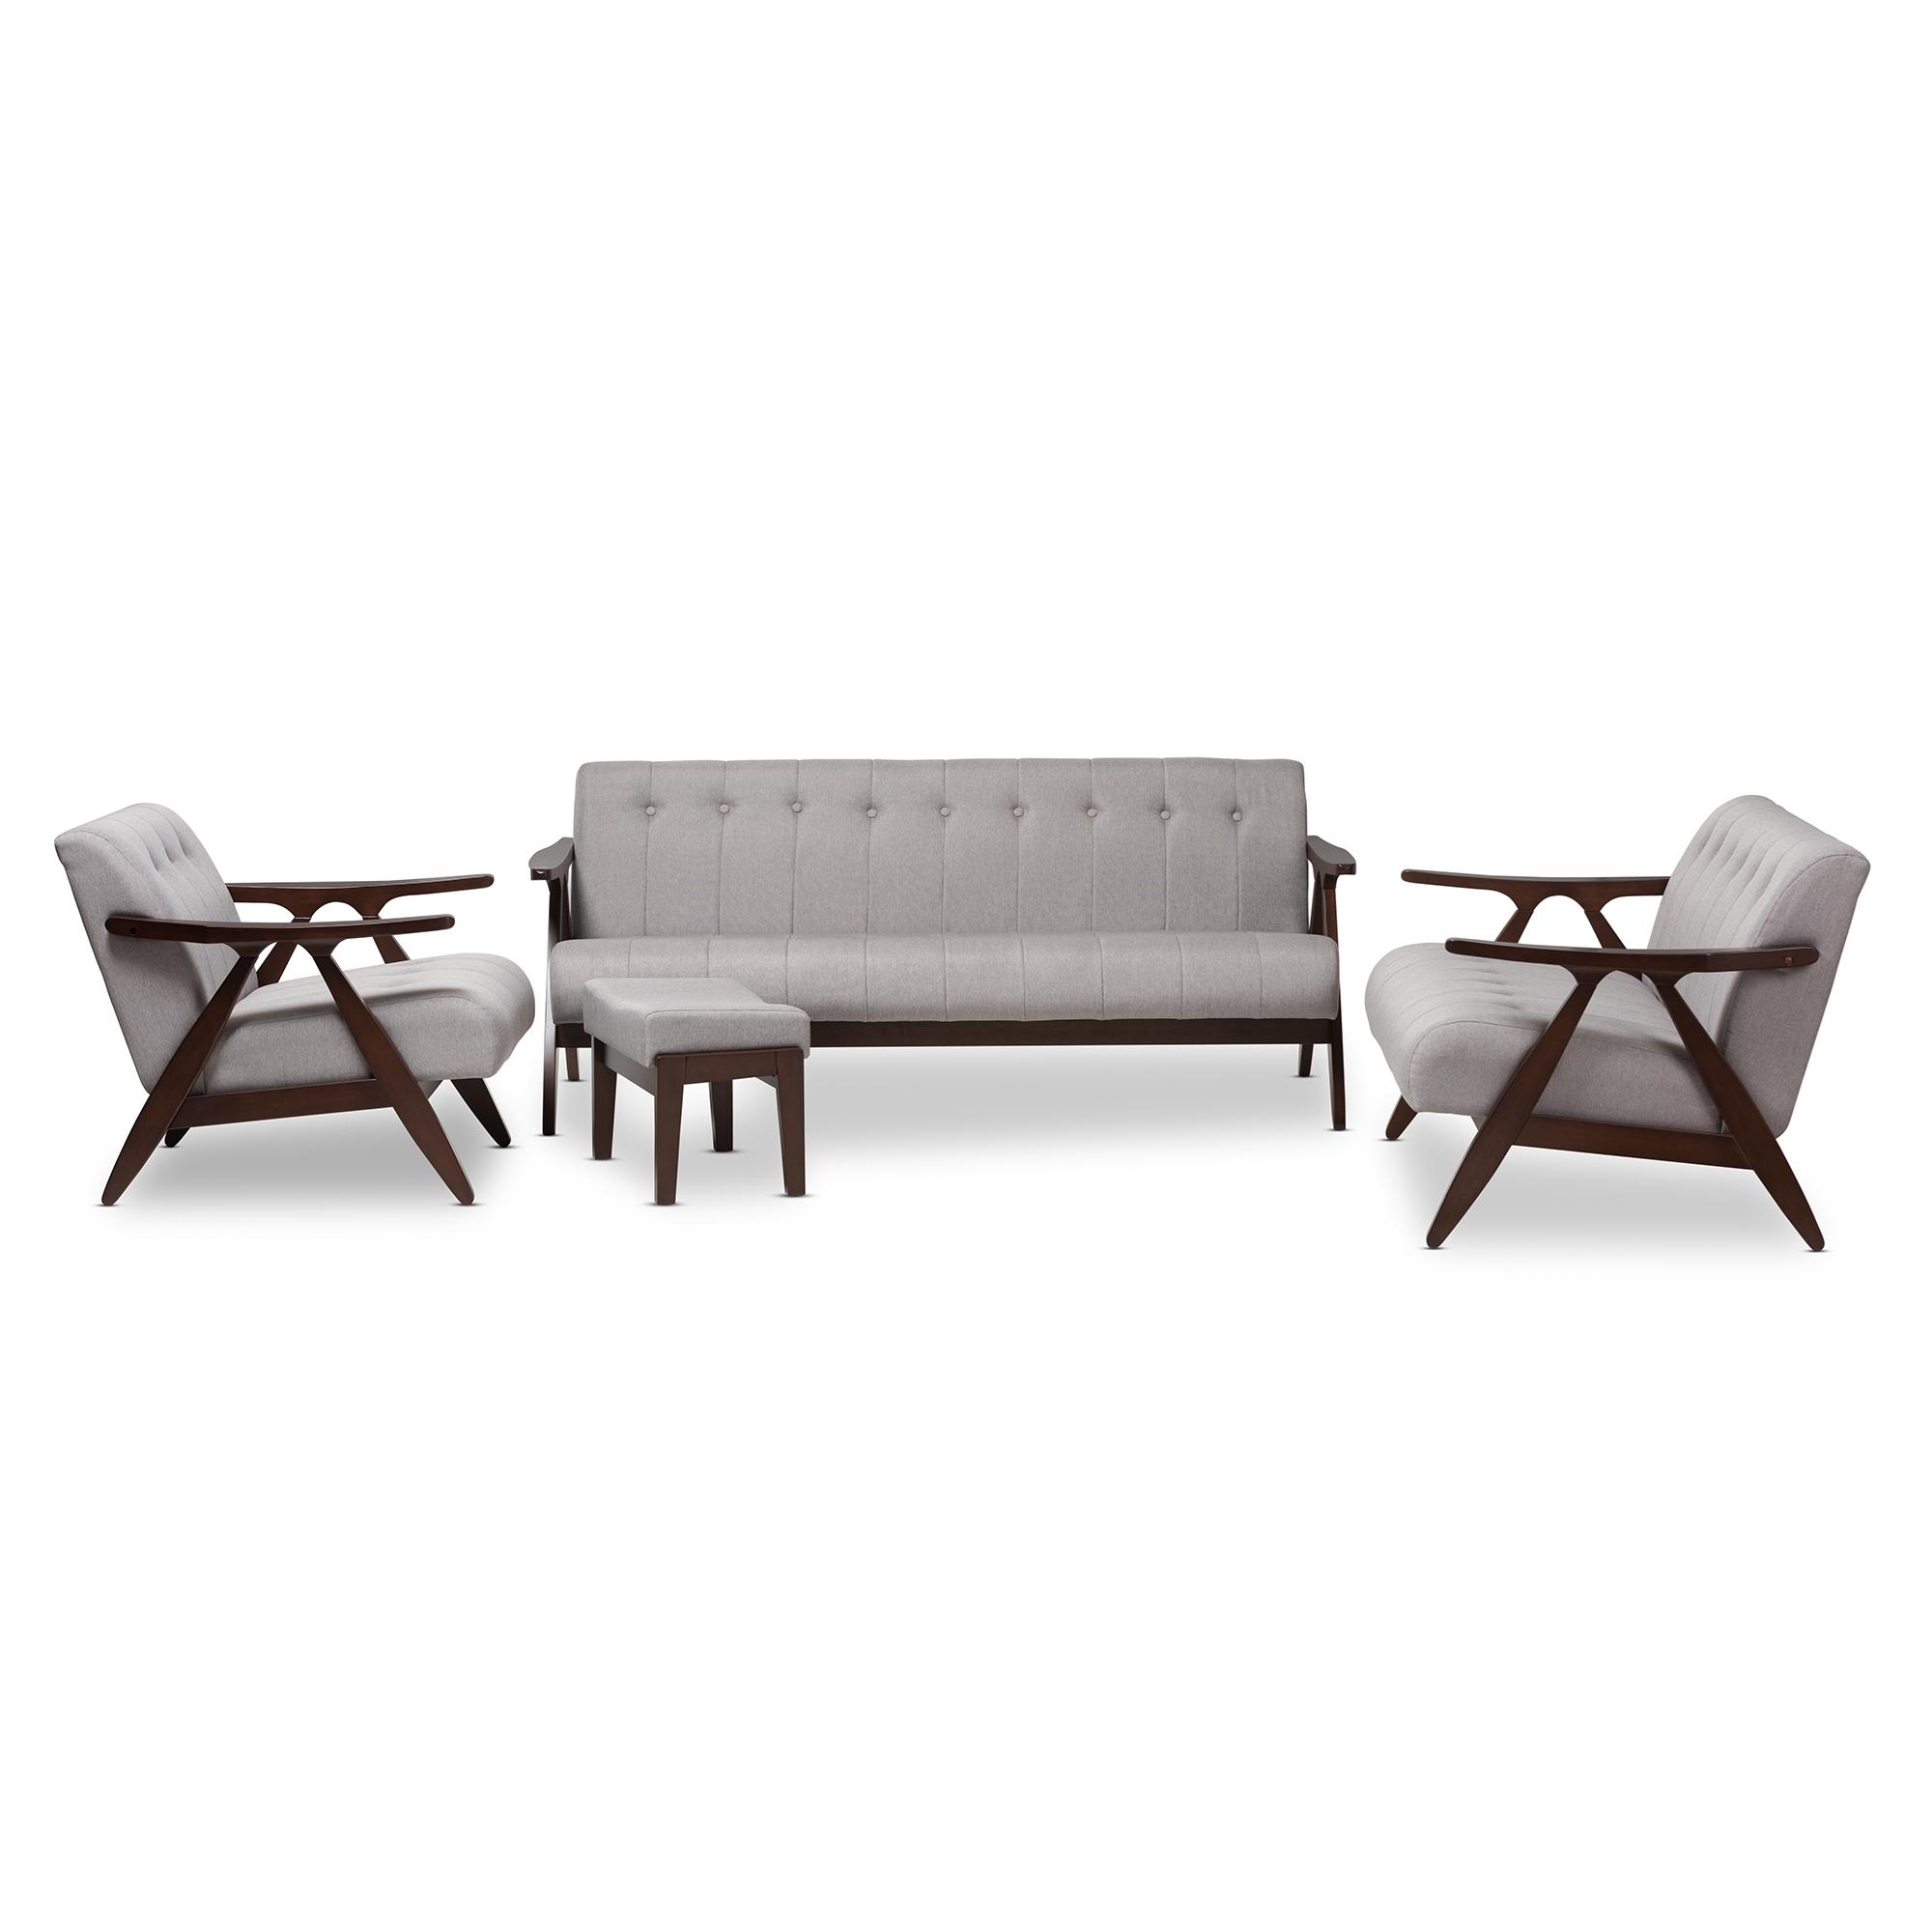 Ordinaire Baxton Studio Enya Mid Century Modern Walnut Wood Grey Fabric 4 Piece Living  Room ...